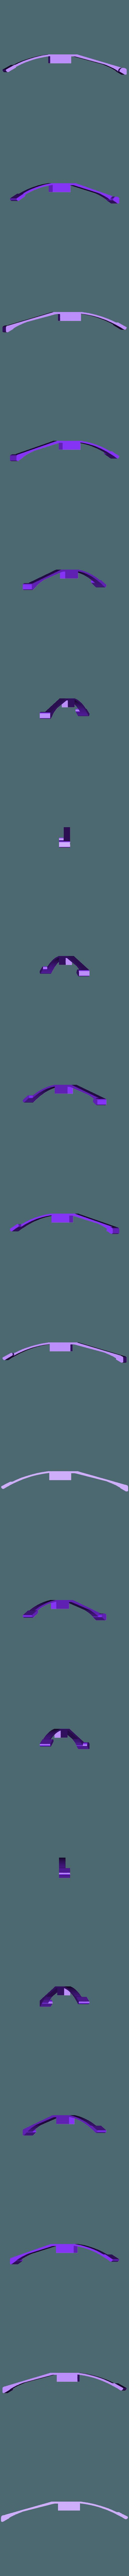 ressort.stl Télécharger fichier STL gratuit Shark knife • Design imprimable en 3D, rfbat